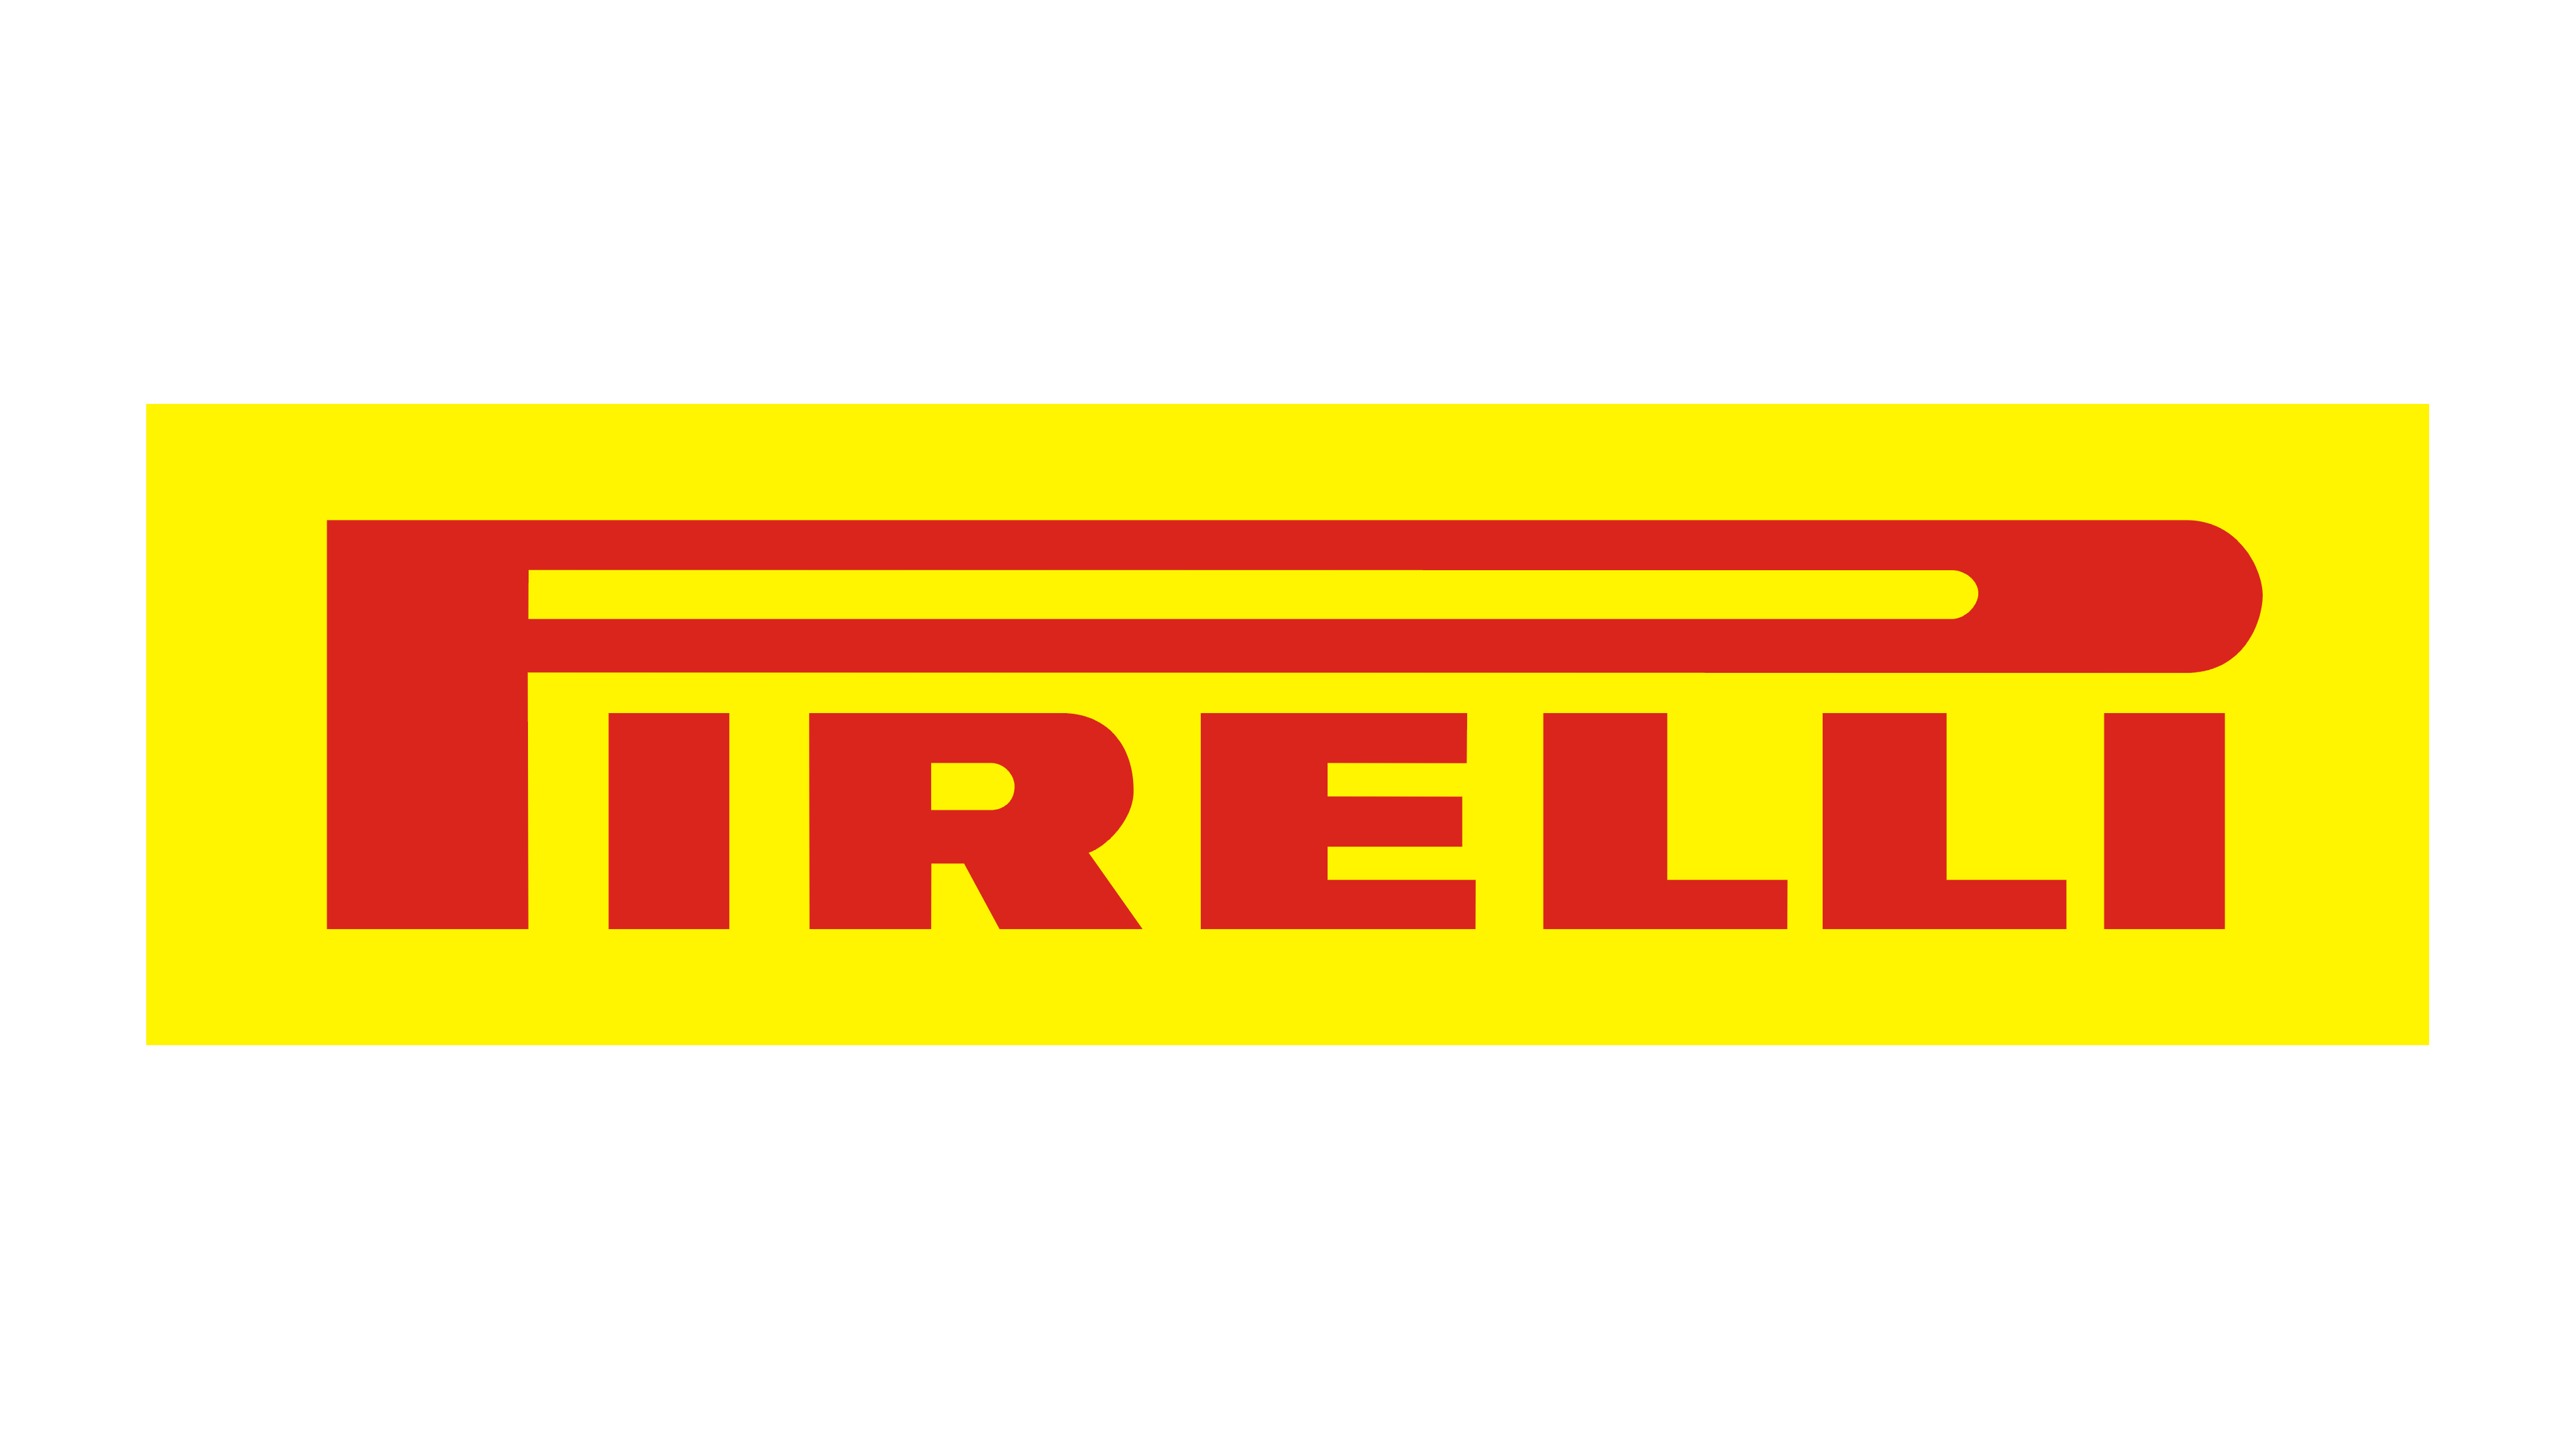 Télephone information entreprise  Pirelli